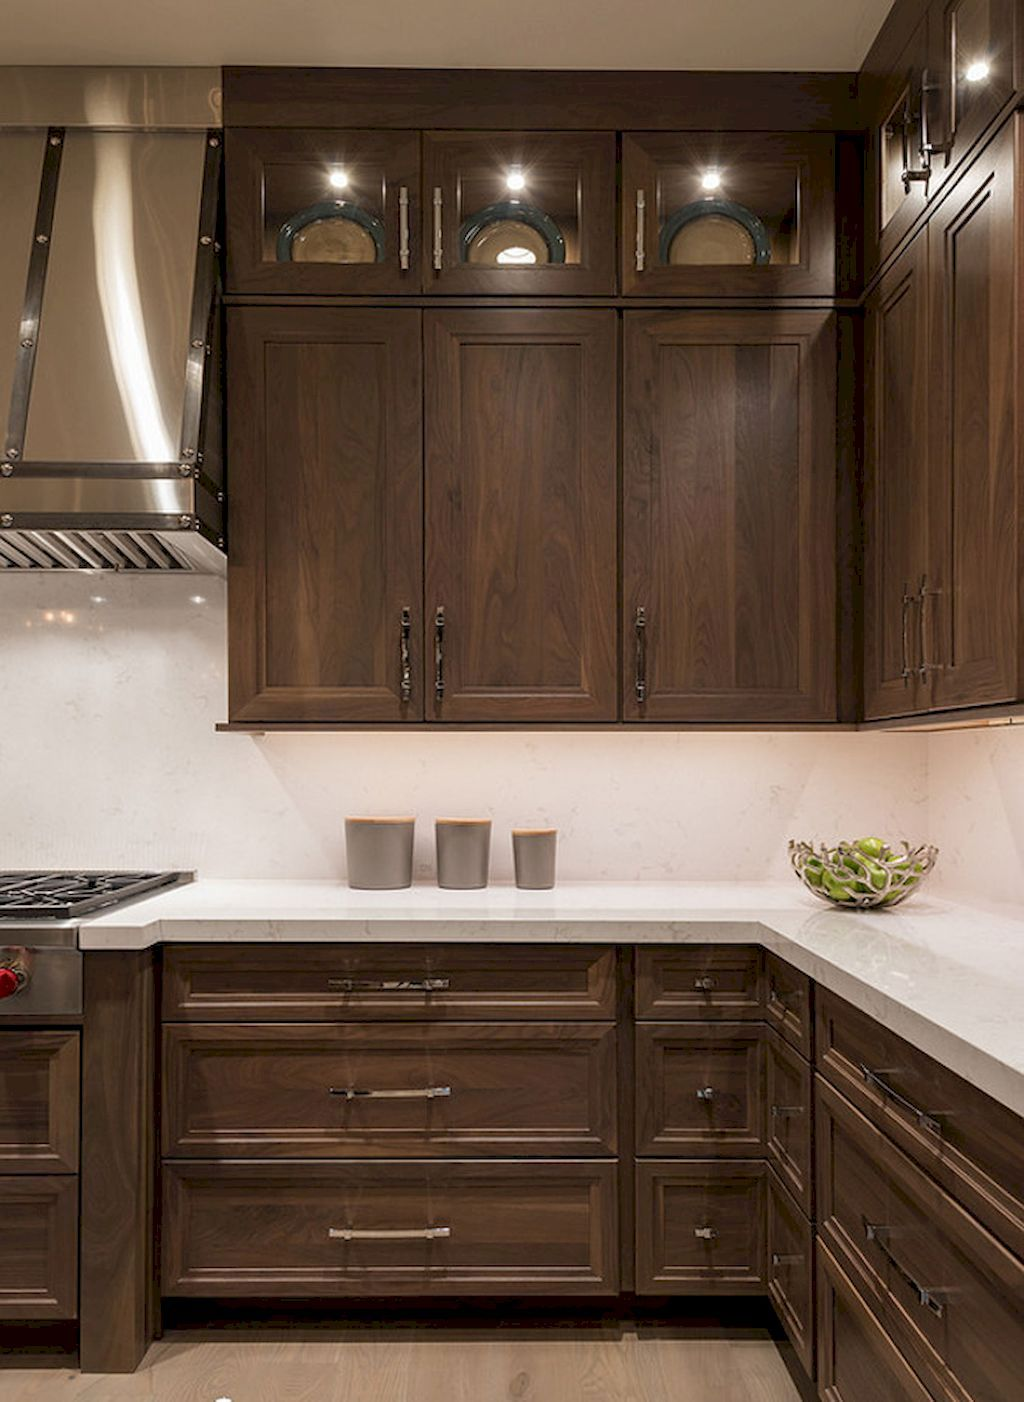 150 Gorgeous Farmhouse Kitchen Cabinets Makeover Ideas 59